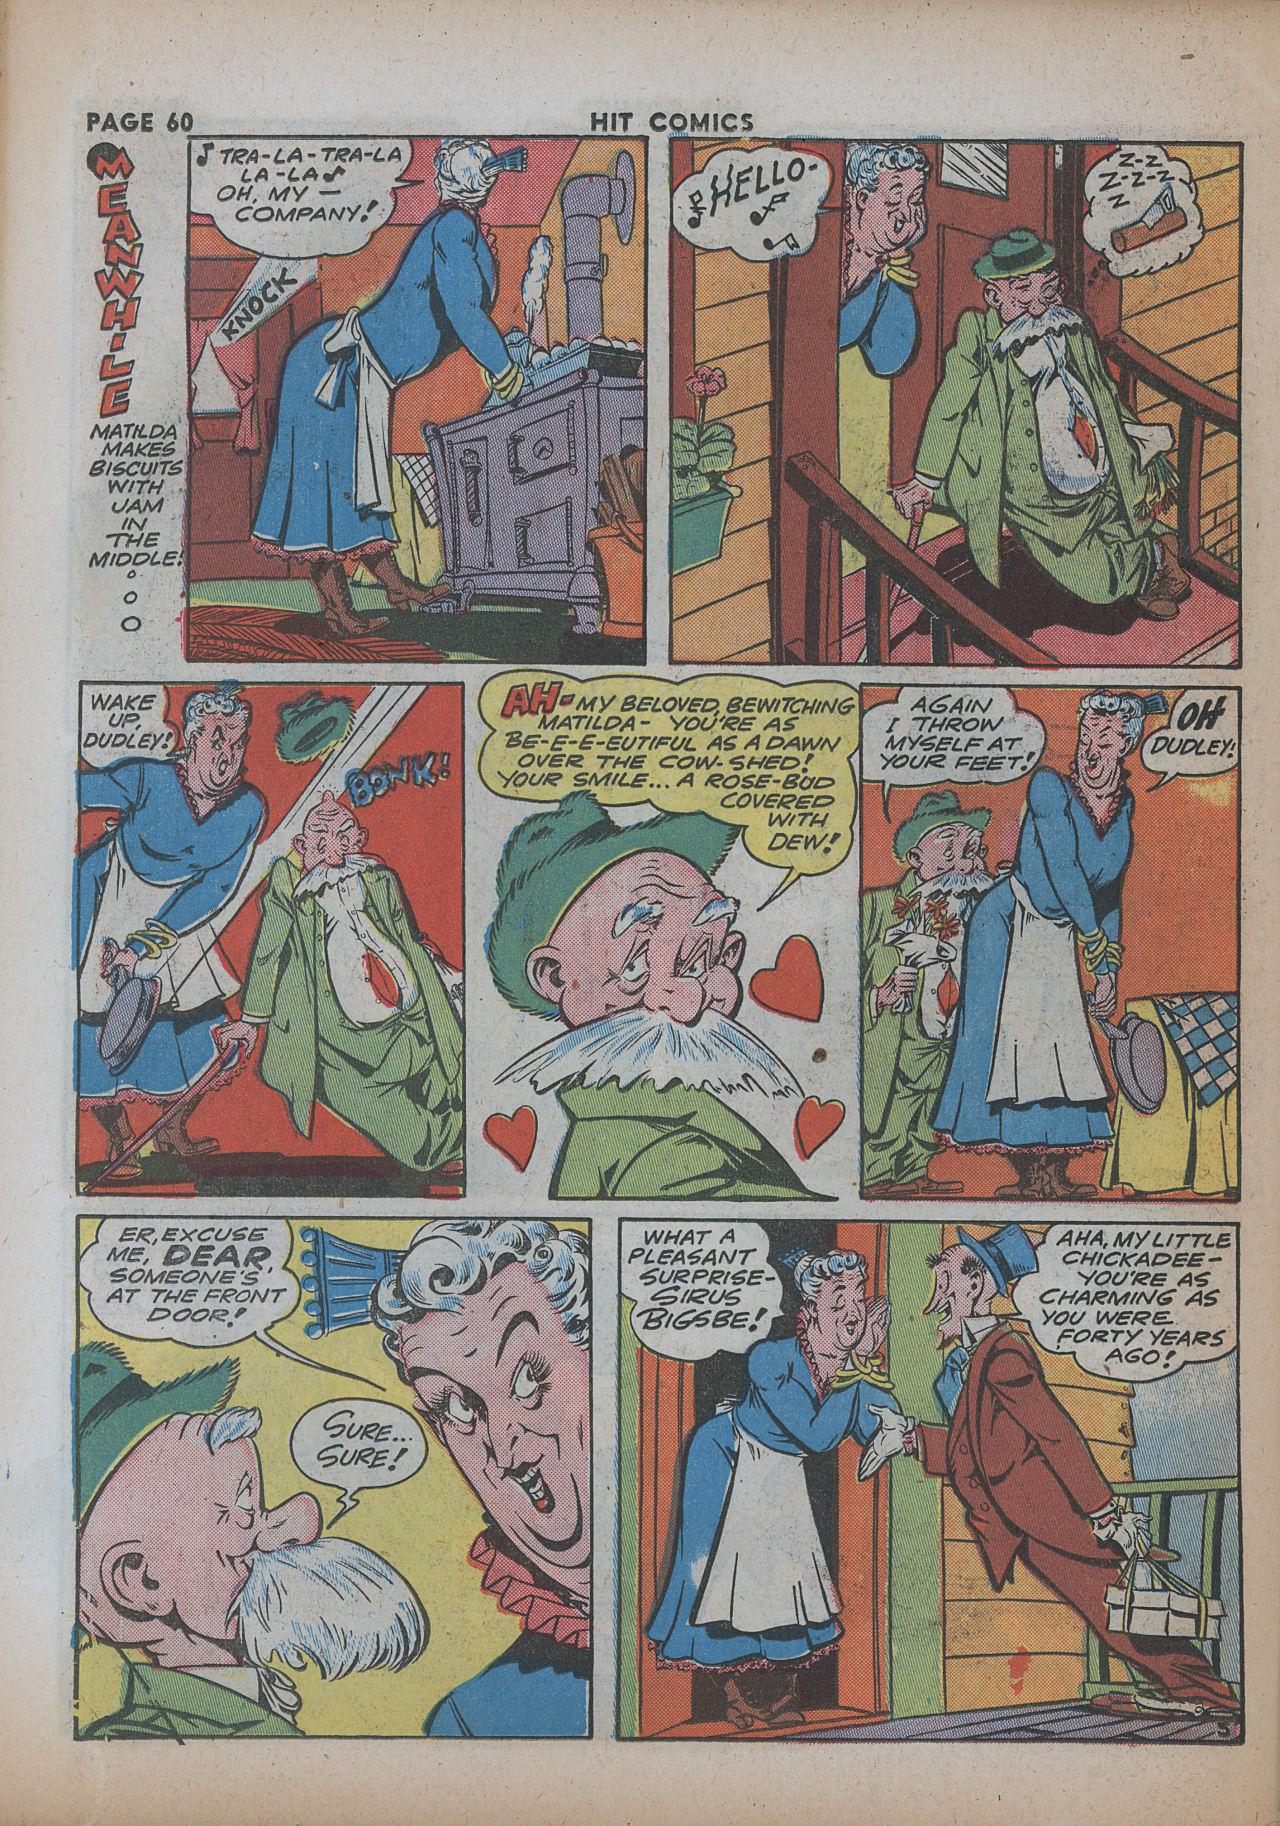 Read online Hit Comics comic -  Issue #26 - 61